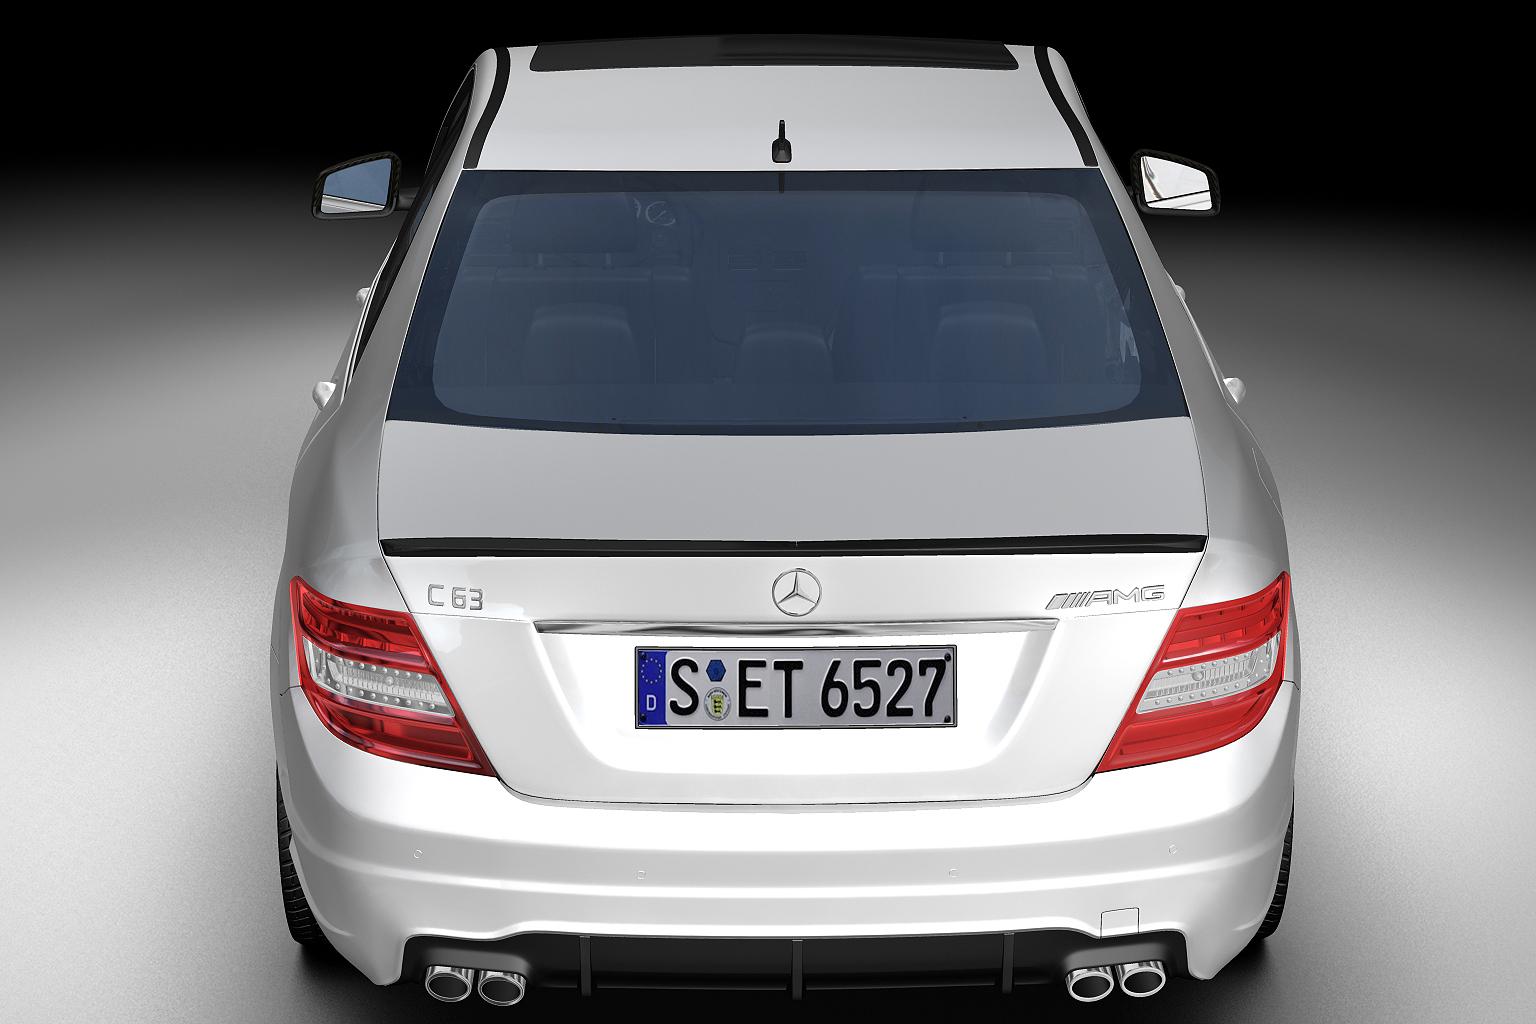 2012 mercedes benz c63 amg 3d modeli 3ds max fbx c4d lwo hrc xsi obj 136250